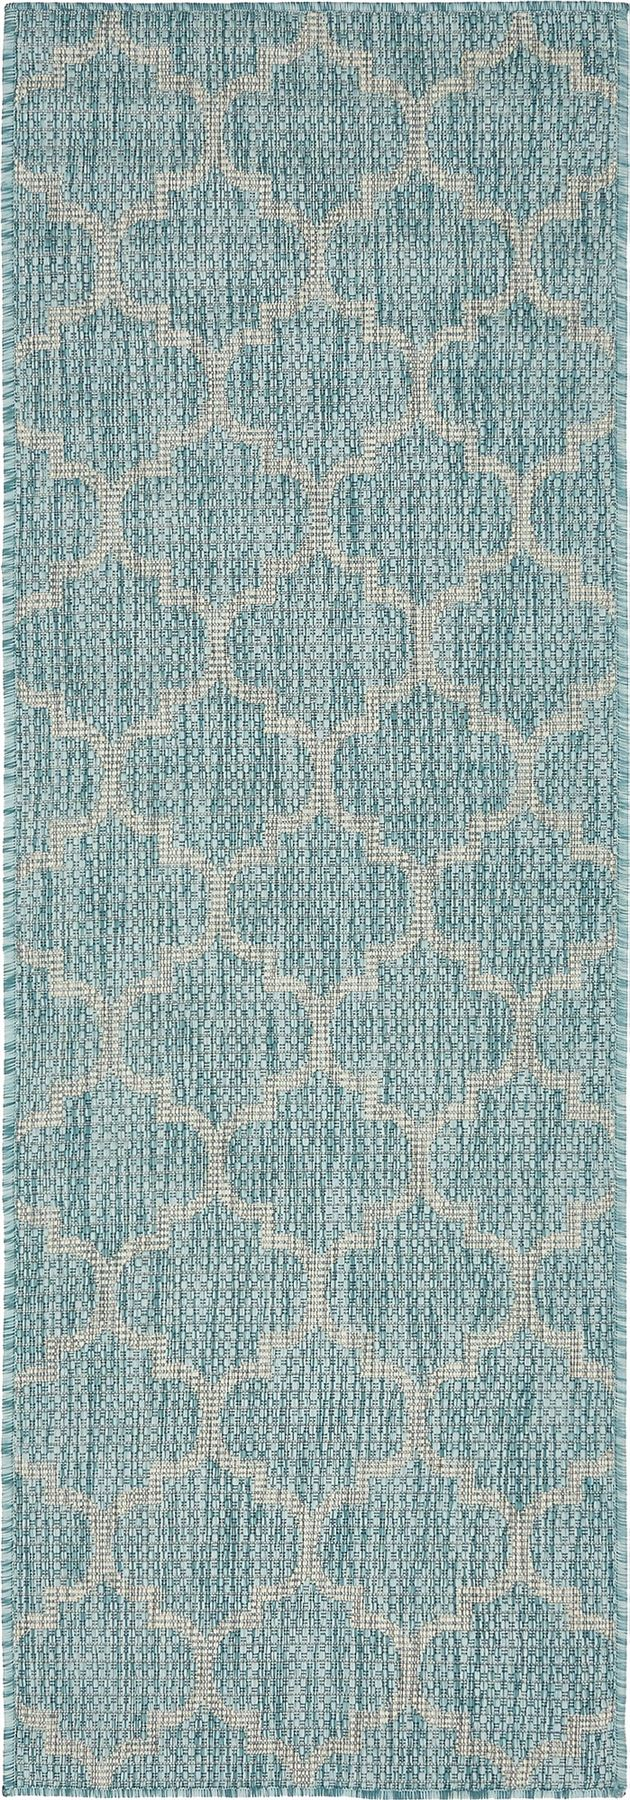 Modern Geometric Contemporary Moroccan Style Carpet Large